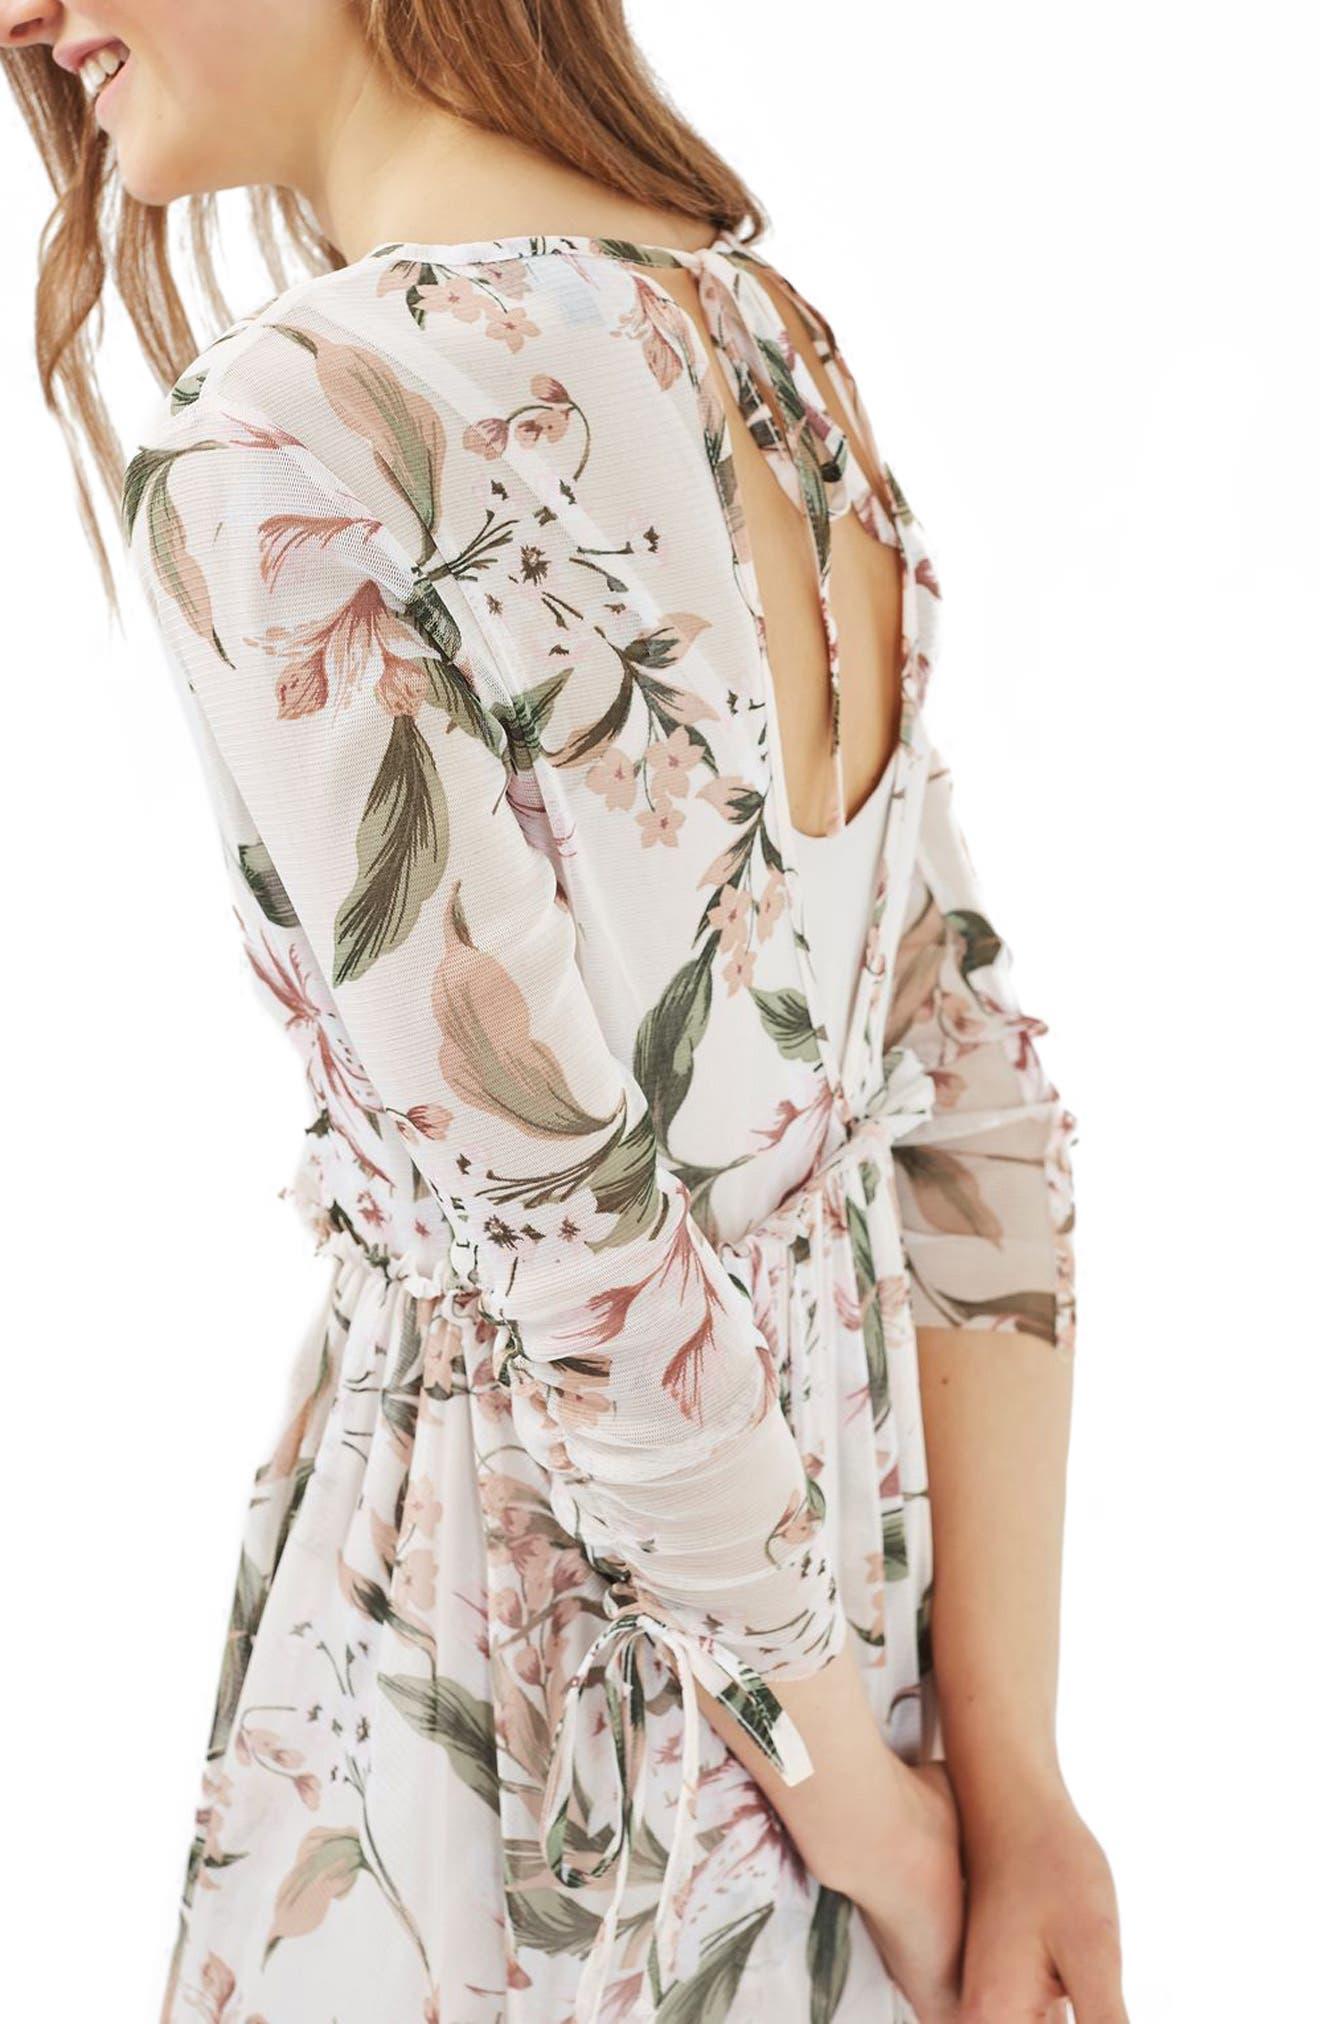 Lily Floral Mesh Dress,                             Alternate thumbnail 4, color,                             900